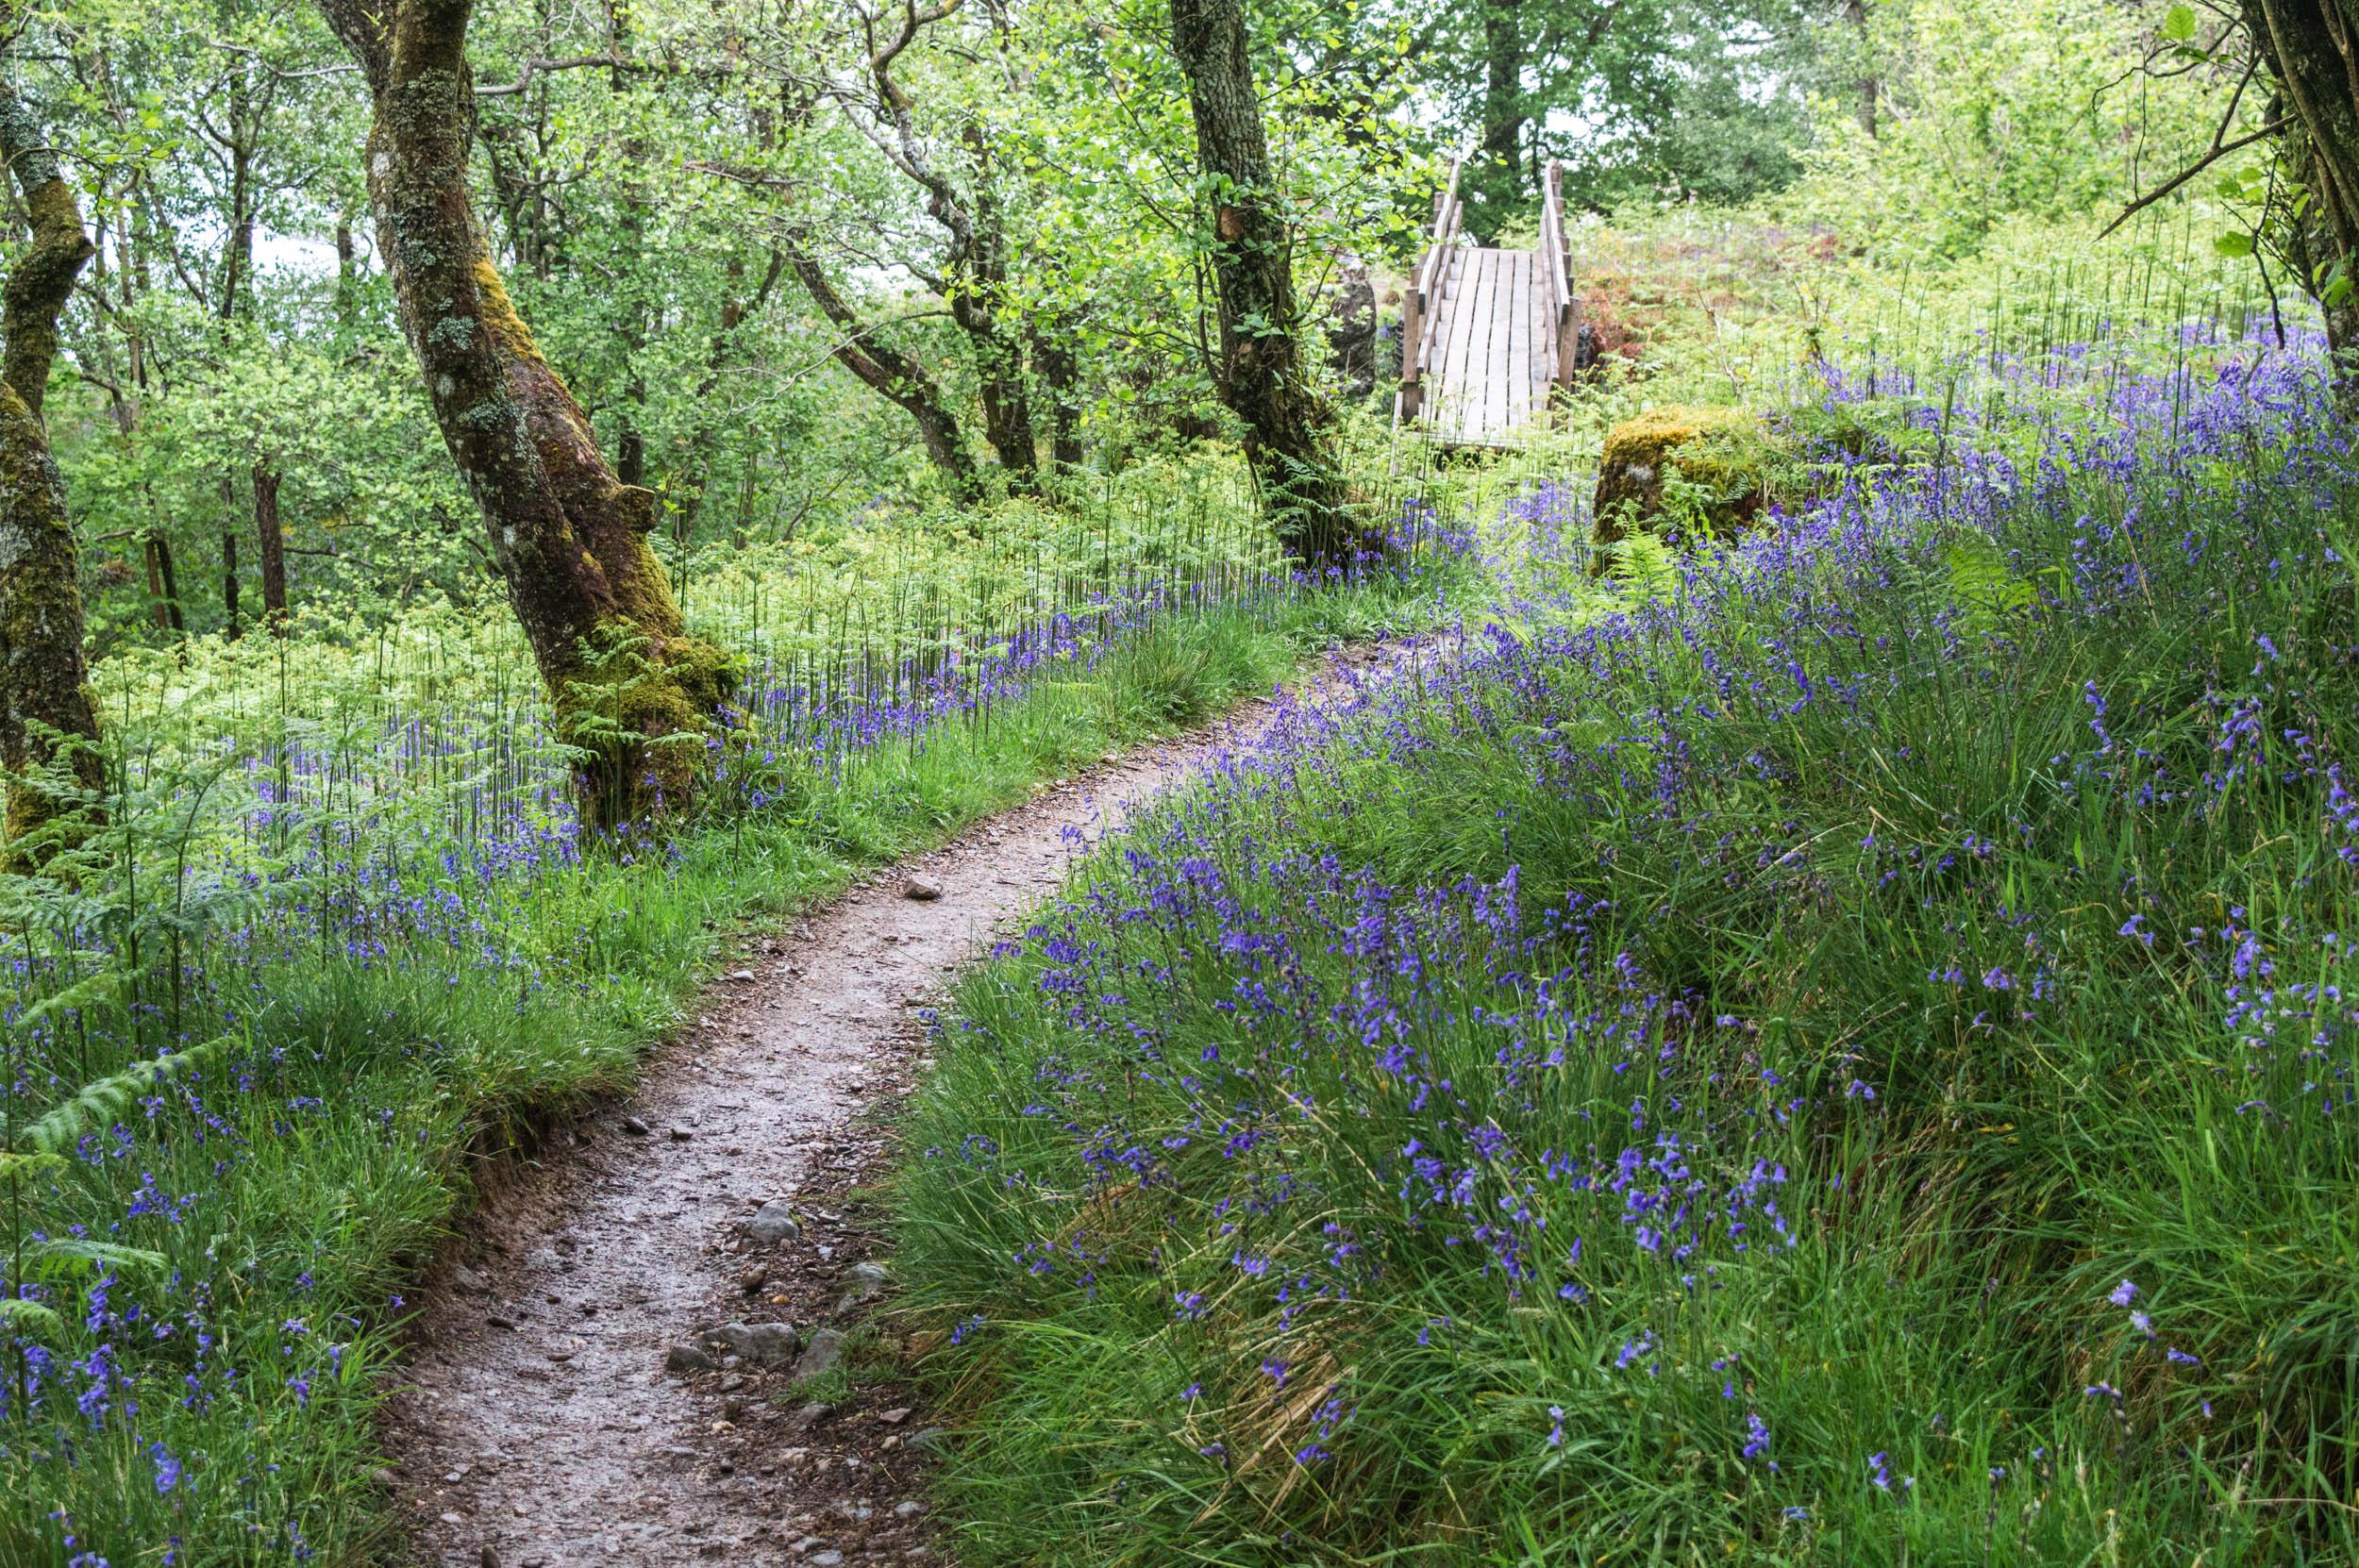 Woodlands-0183.jpg